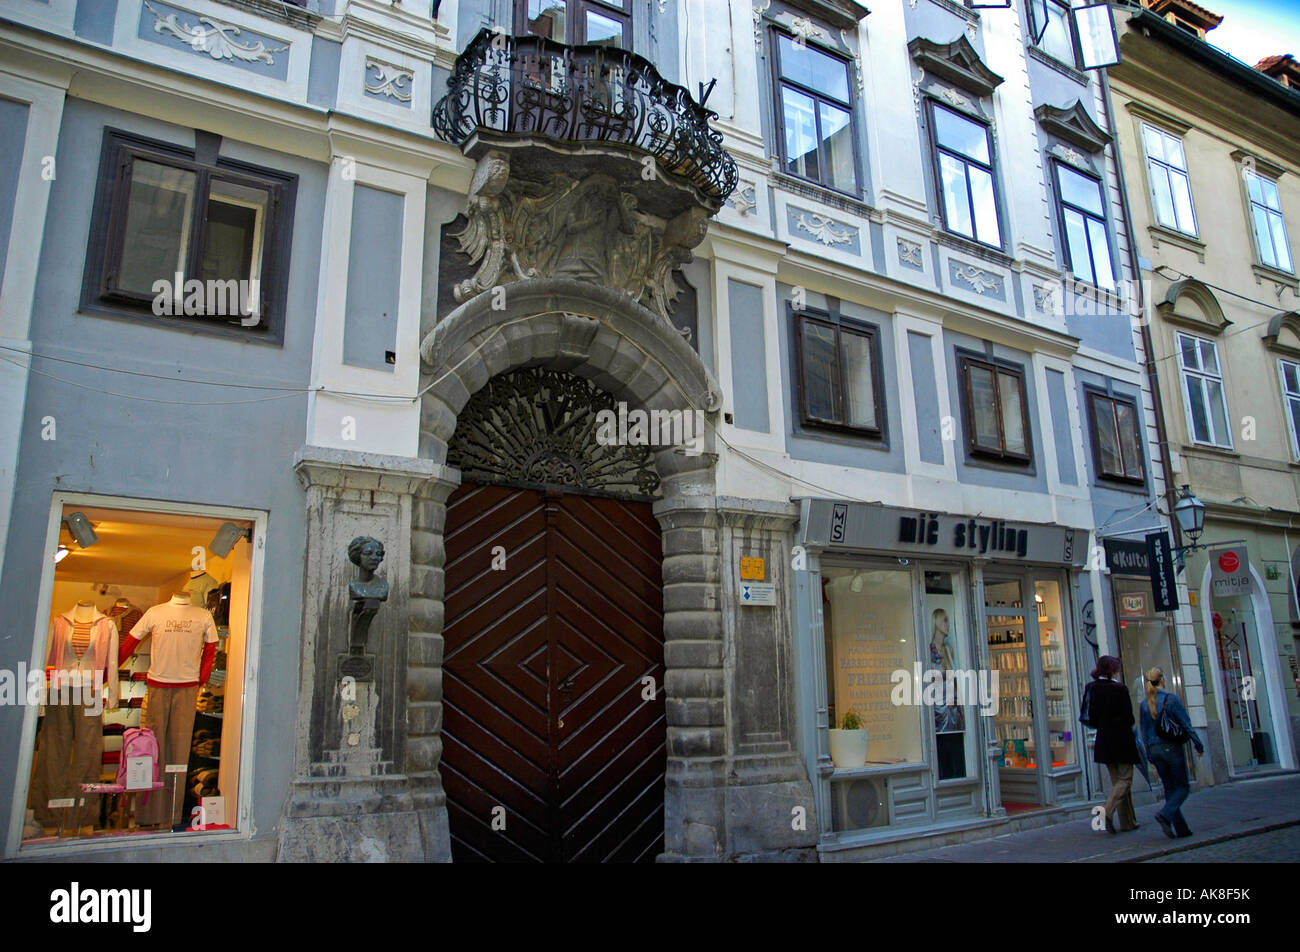 House Lili Novy / Ljubljana - Stock Image